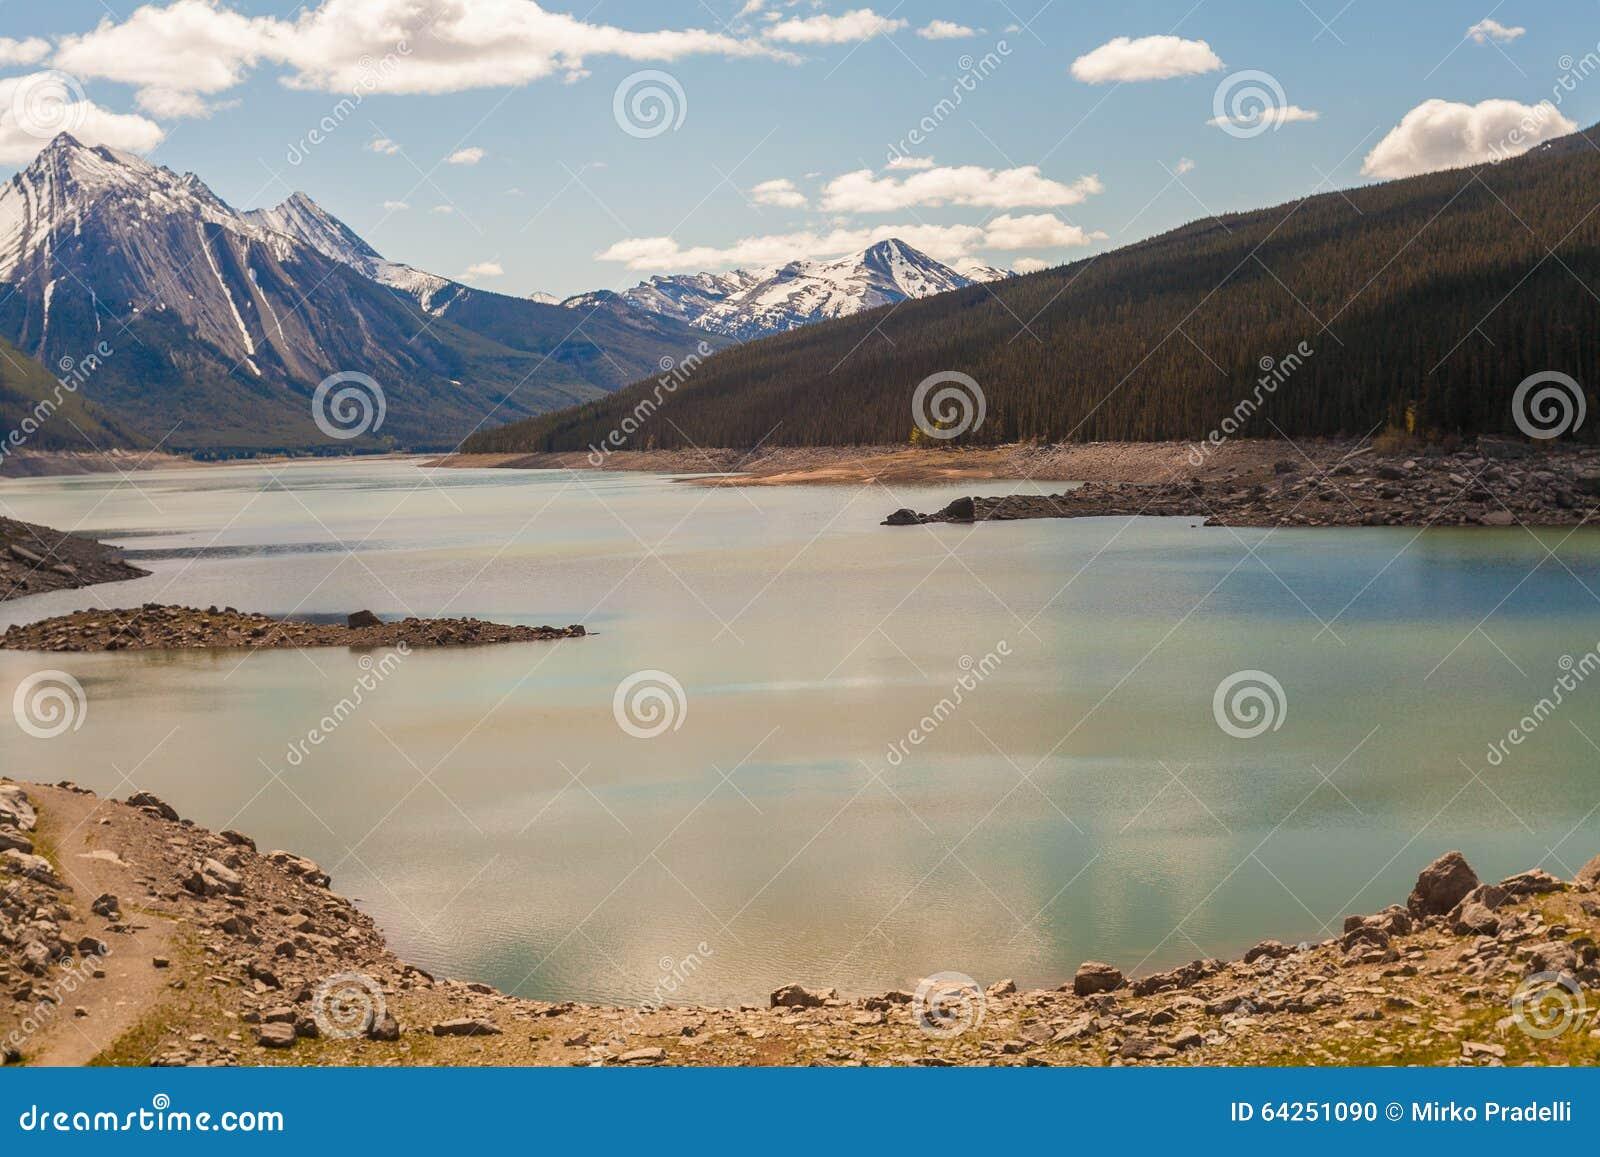 Medycyna jezioro, Alberta, Kanada